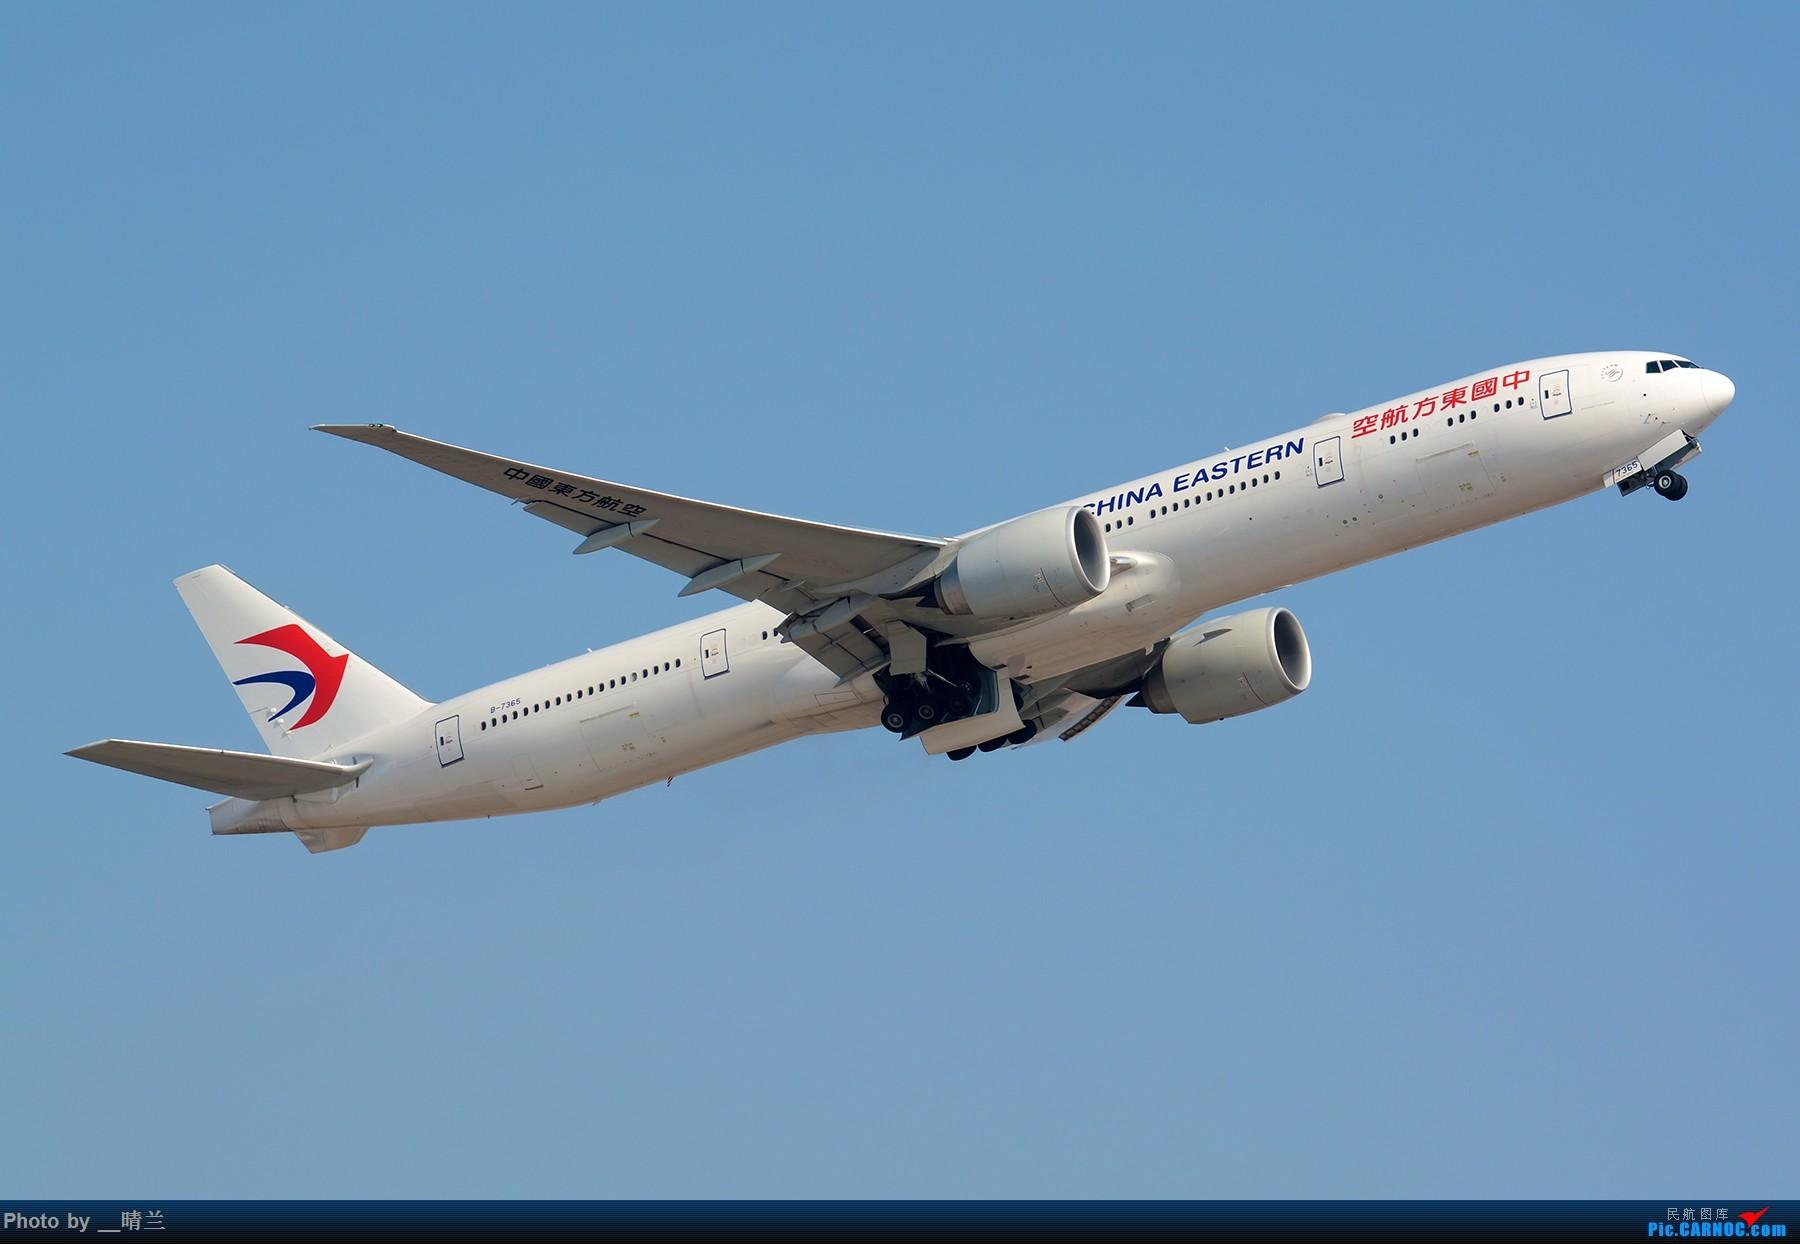 Re:[原创]【PVG】大年初二 新角度解锁 集齐7只77W 召唤748一枚!#祝各位飞友新的一年一飞冲天!# BOEING 777-300ER B-7365 中国上海浦东国际机场